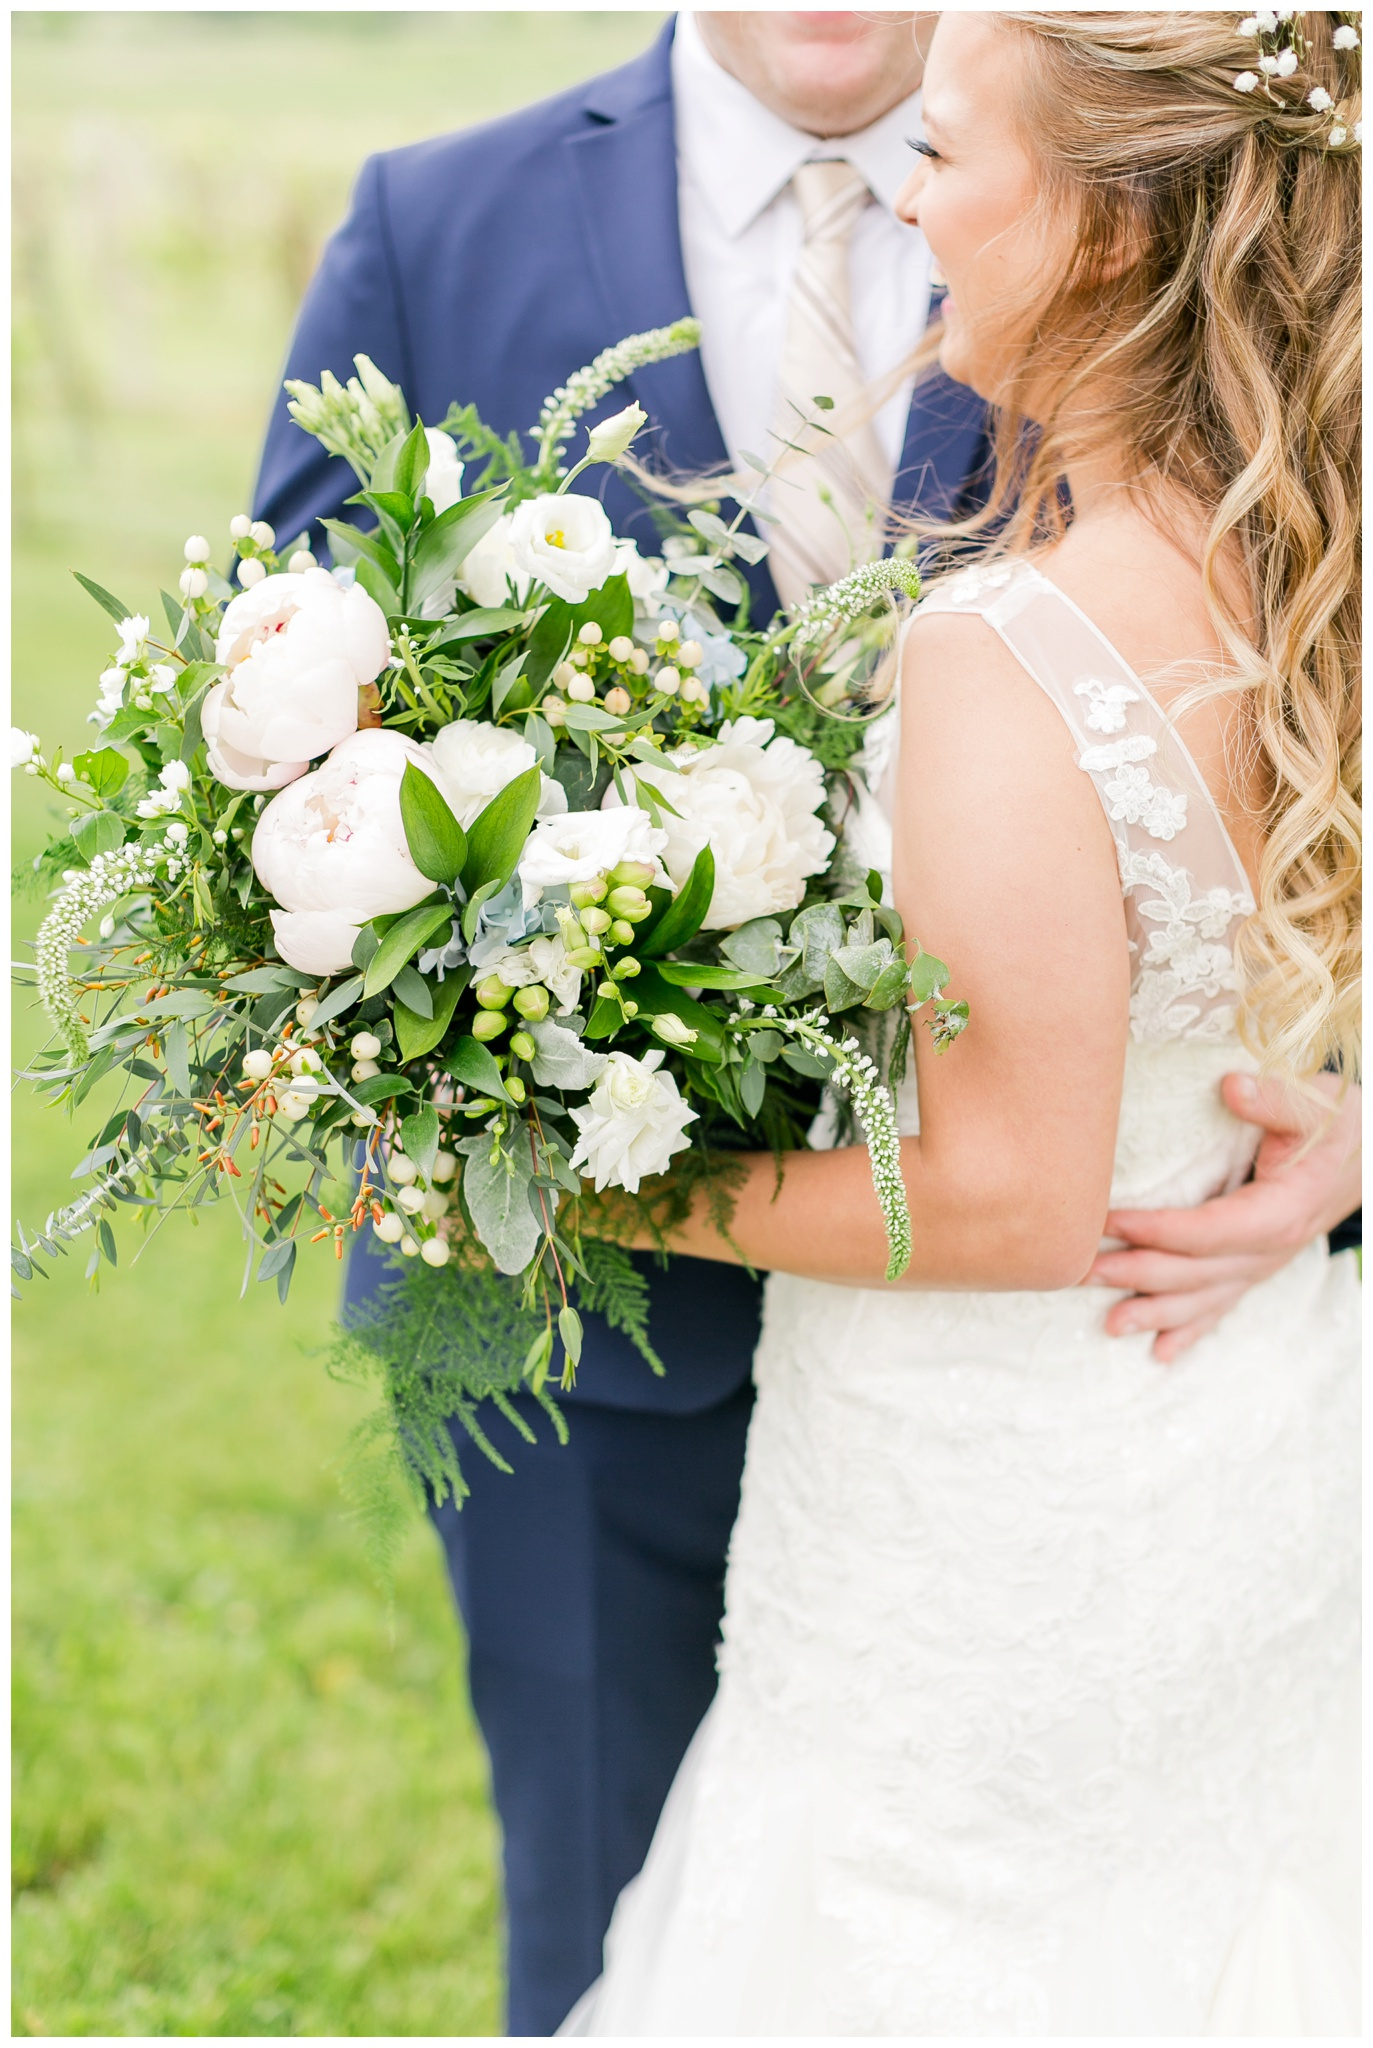 over_the_vines_wedding_edgerton_wisconsin_wedding_caynay_photo_3989.jpg